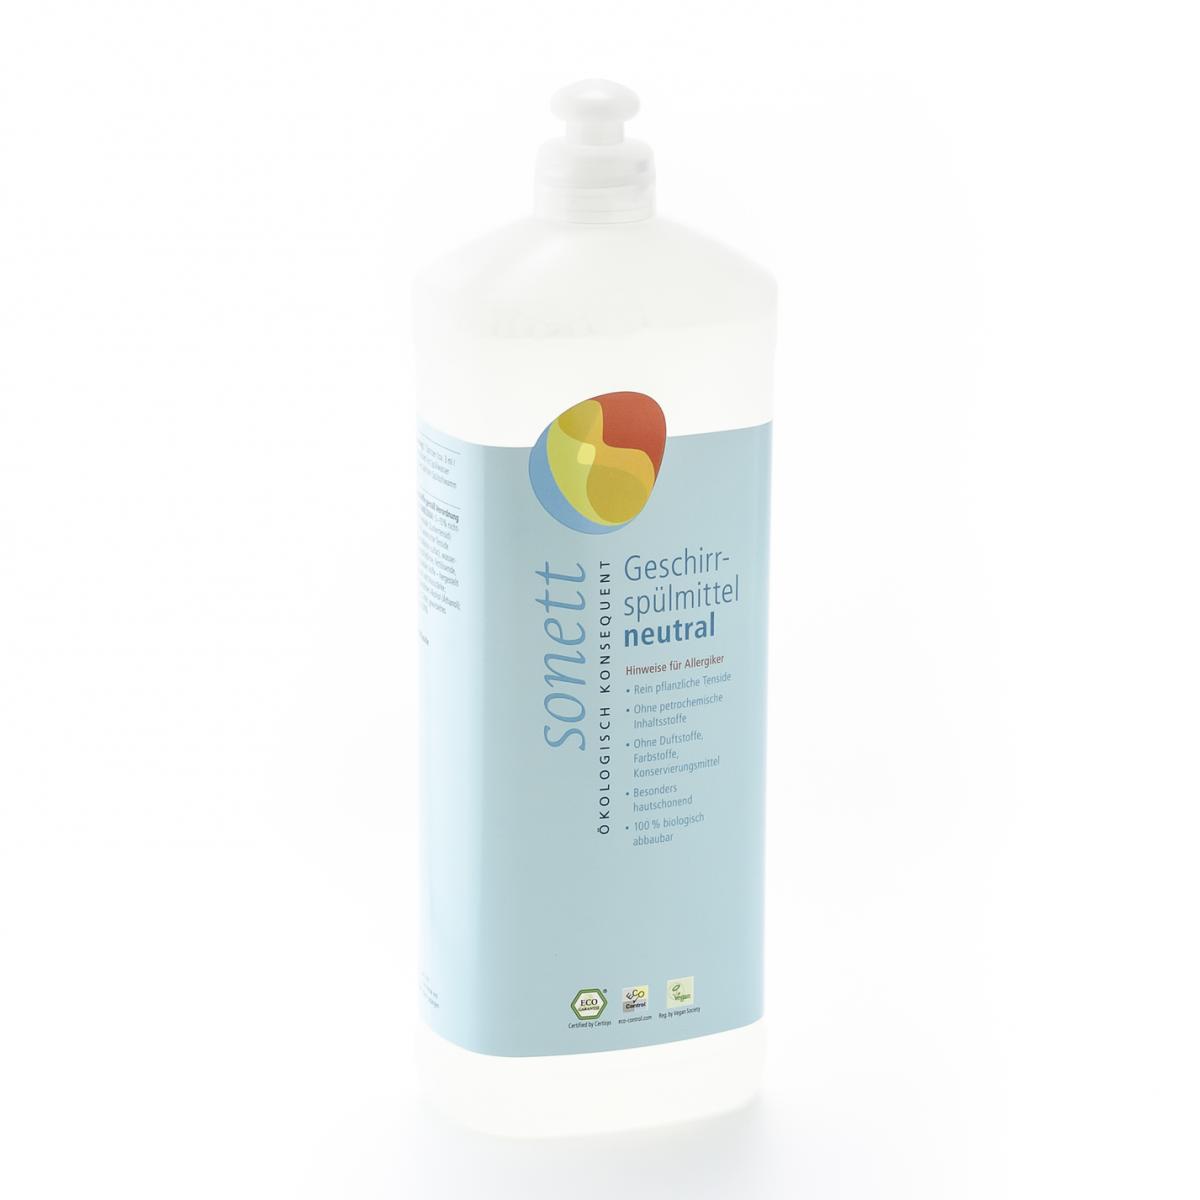 Geschirrspülmittel sensitiv, Nachfüllflasche Flasche 1 l/Plastik Einweg - Sonett